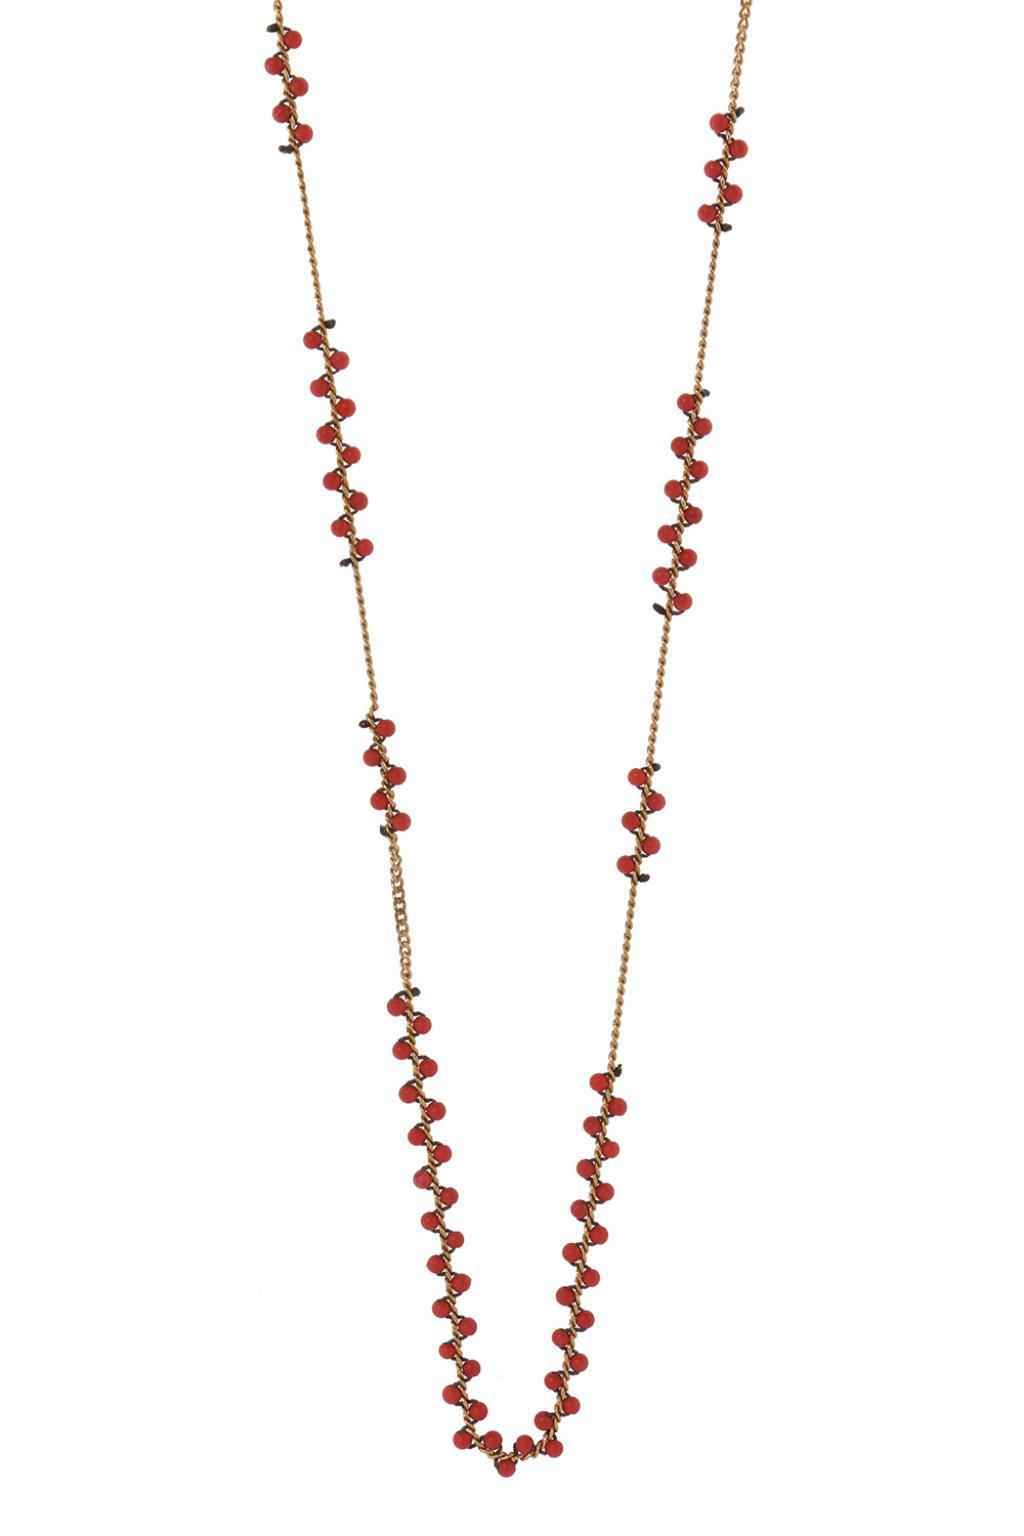 Isabel Marant Embellished necklace ML2Rs